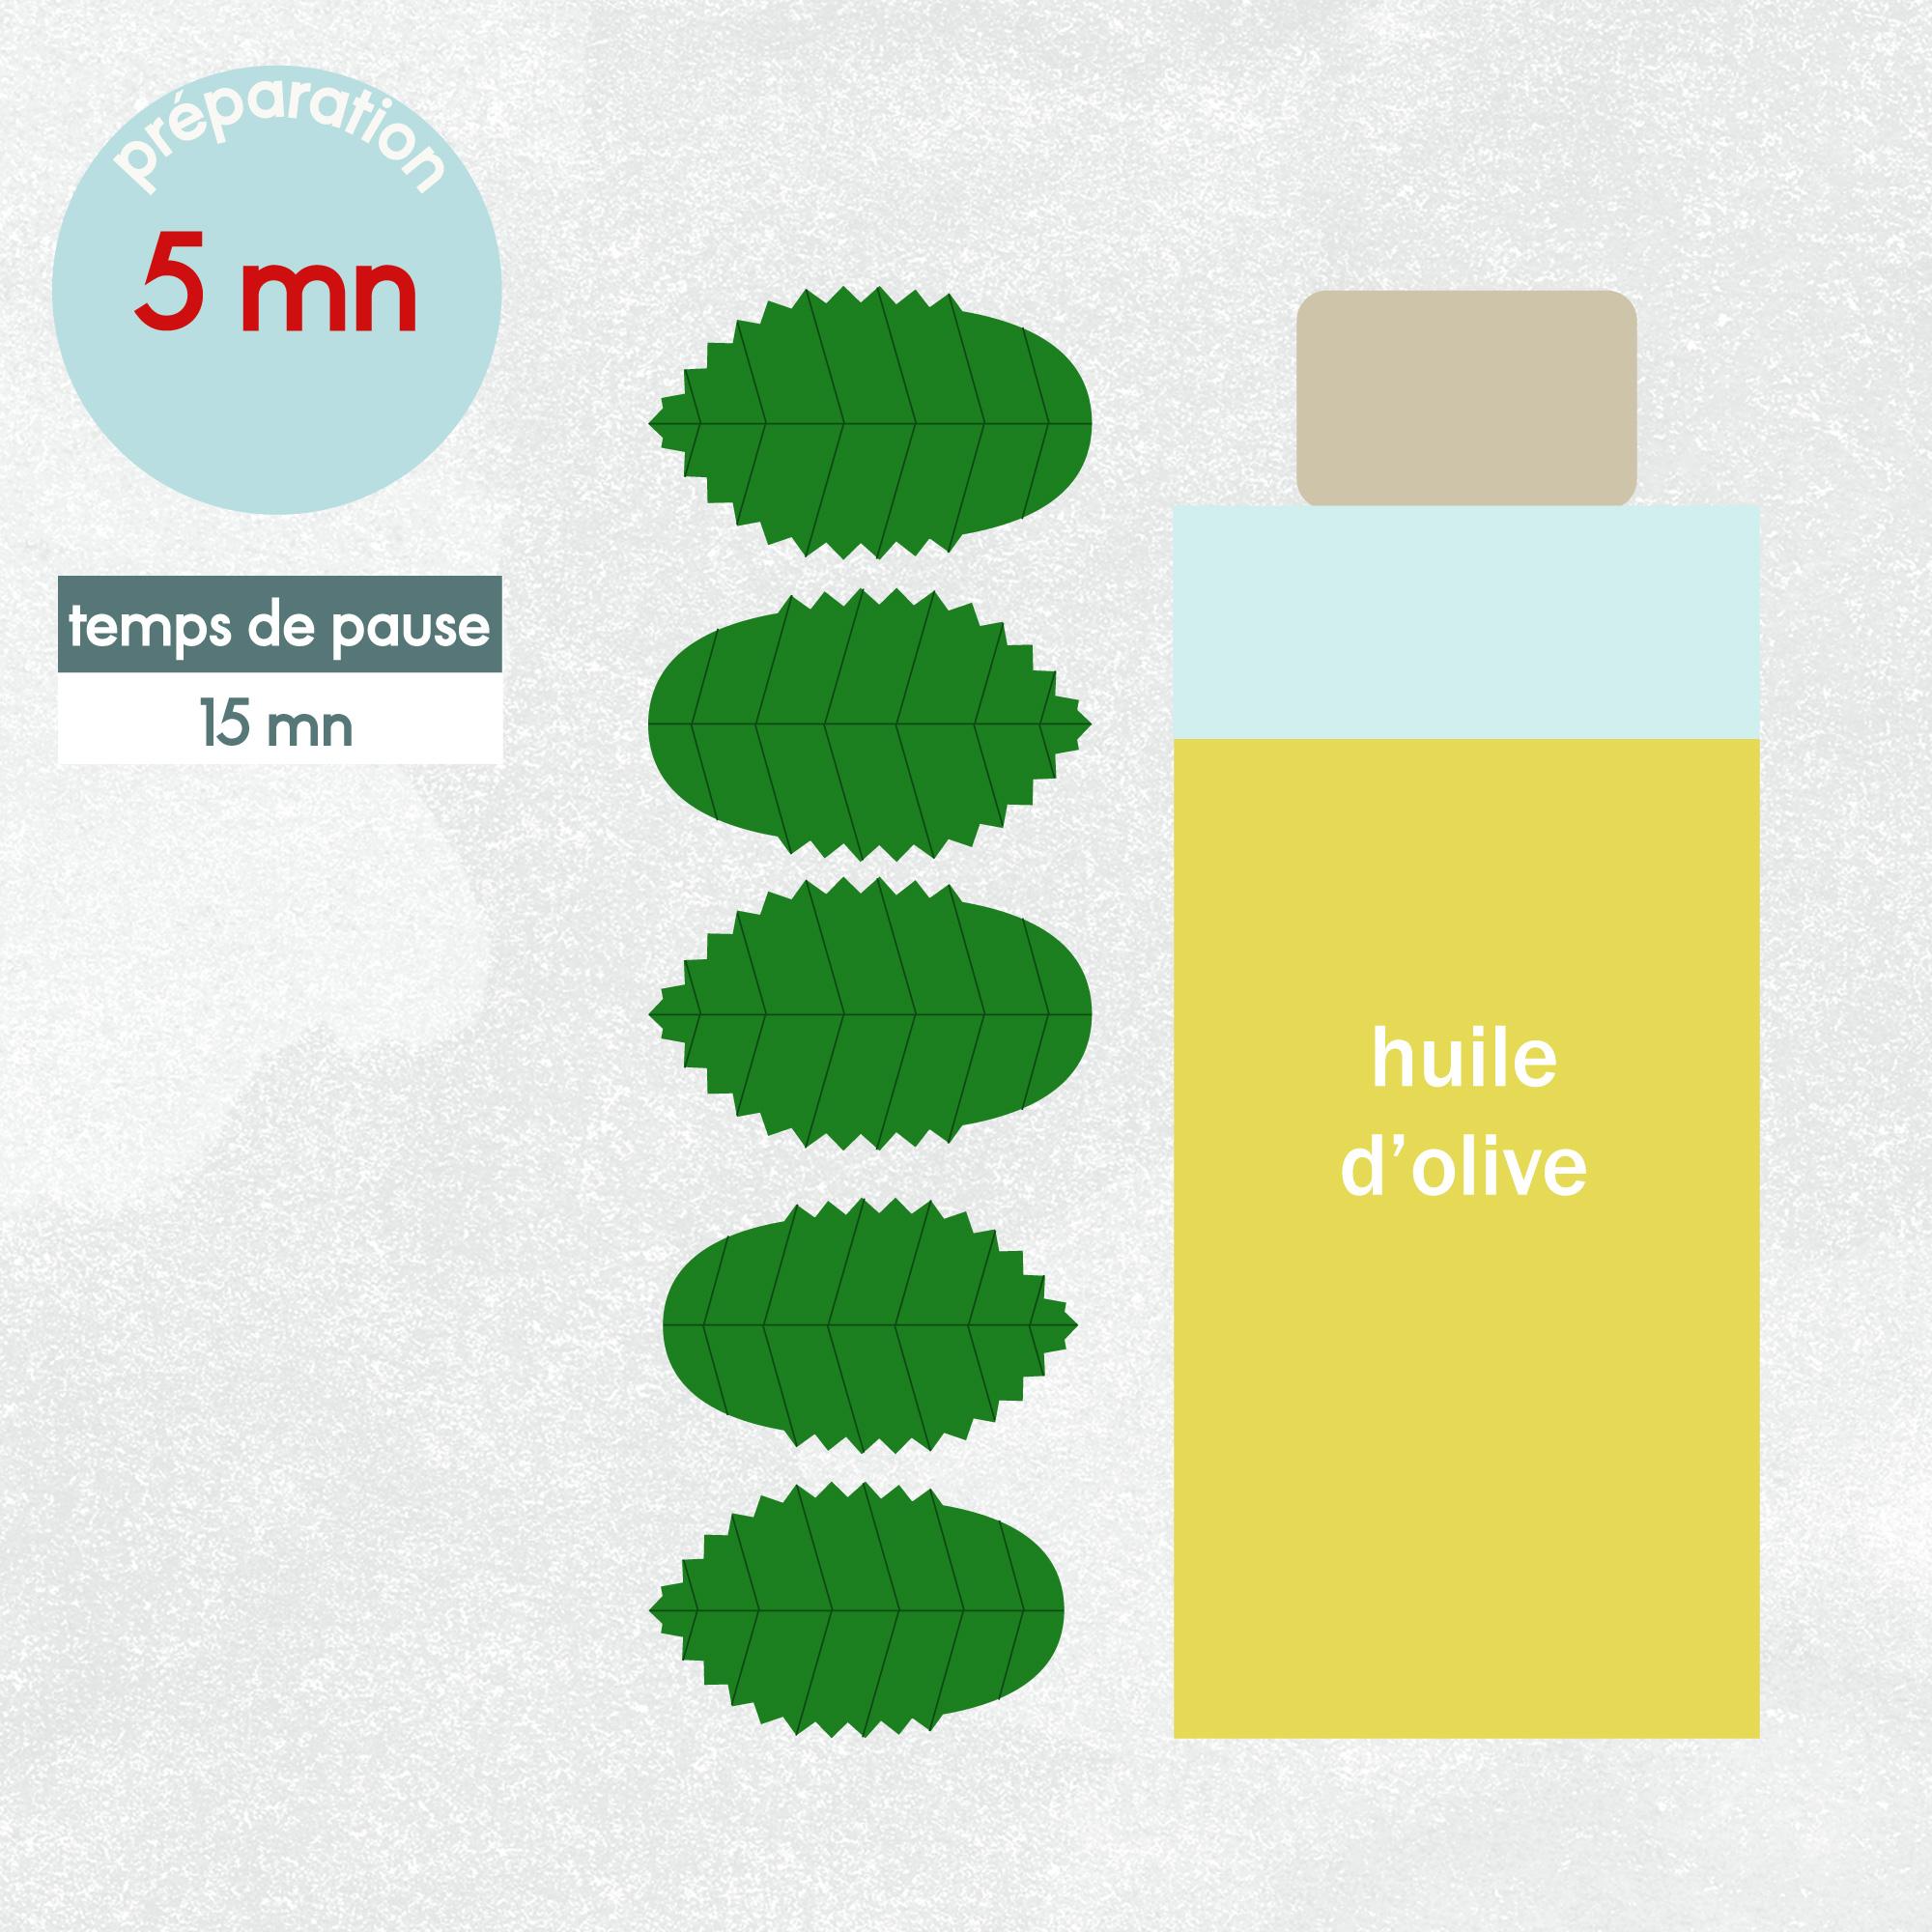 Huile cheveux maison ma recette anti pelliculaire for Antipelliculaire maison